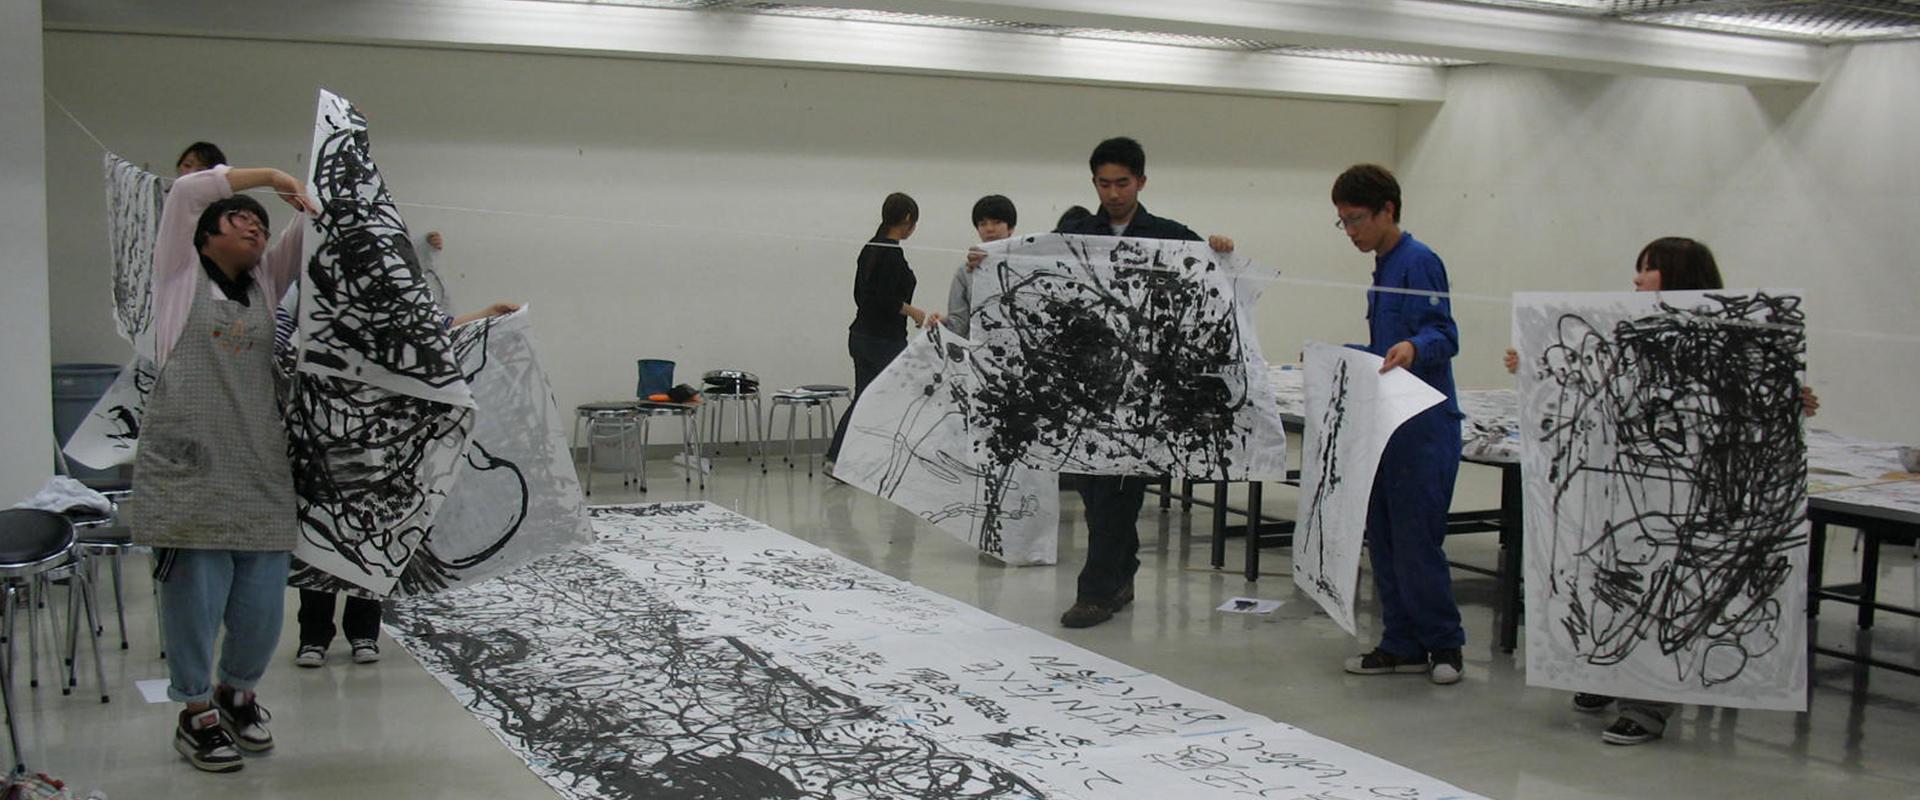 International_Gallery-8